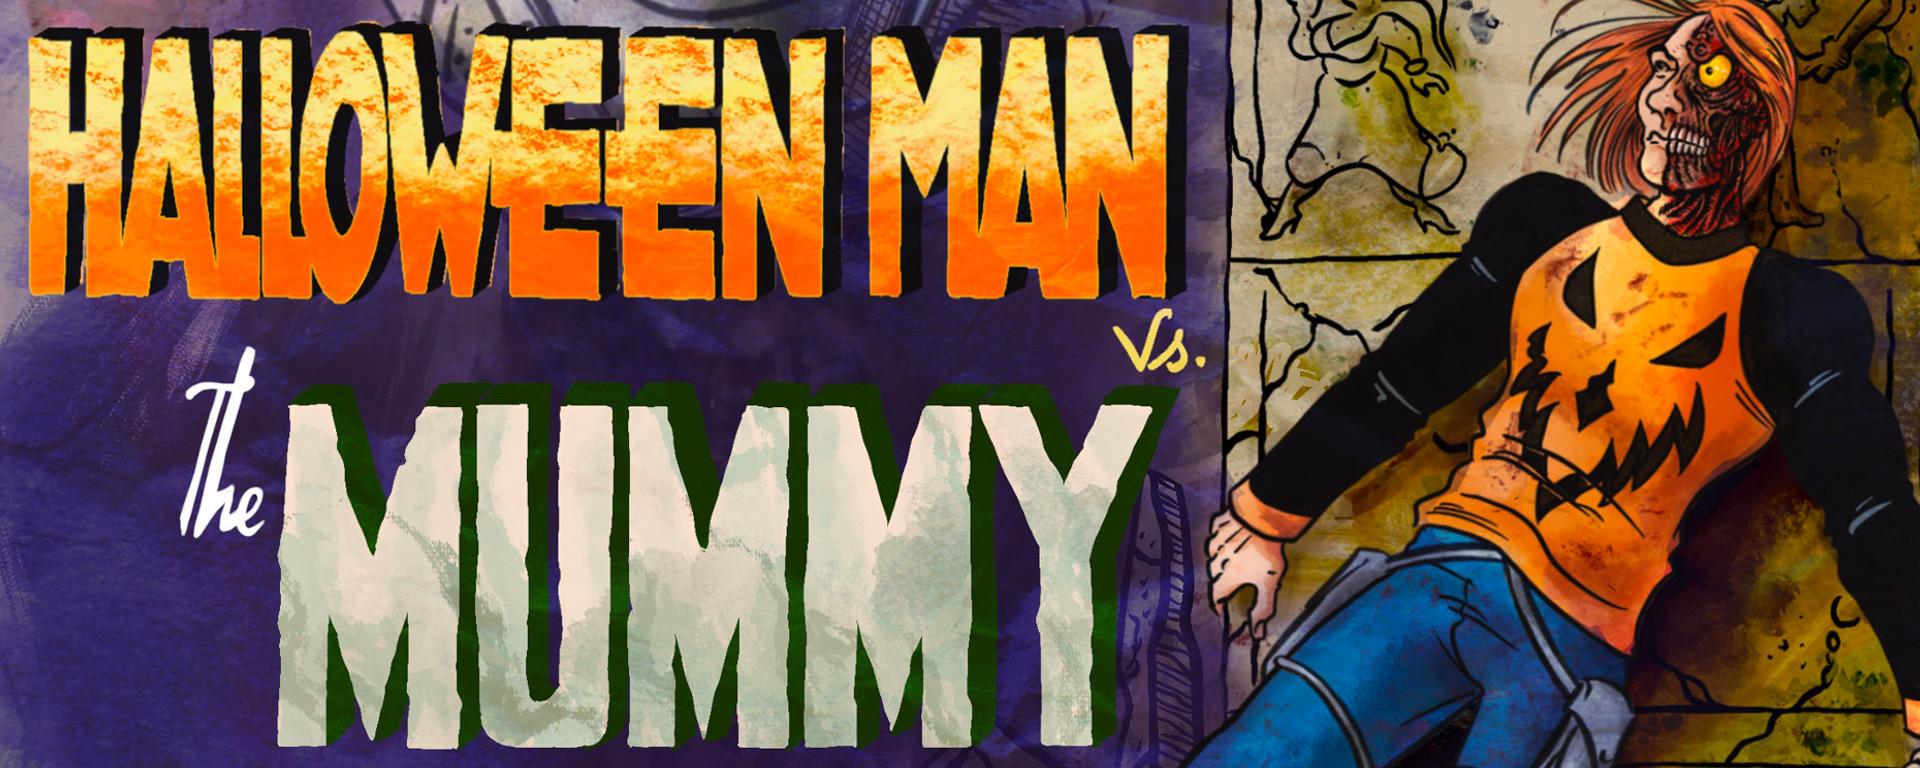 Halloween Man Vs. The Mummy Header